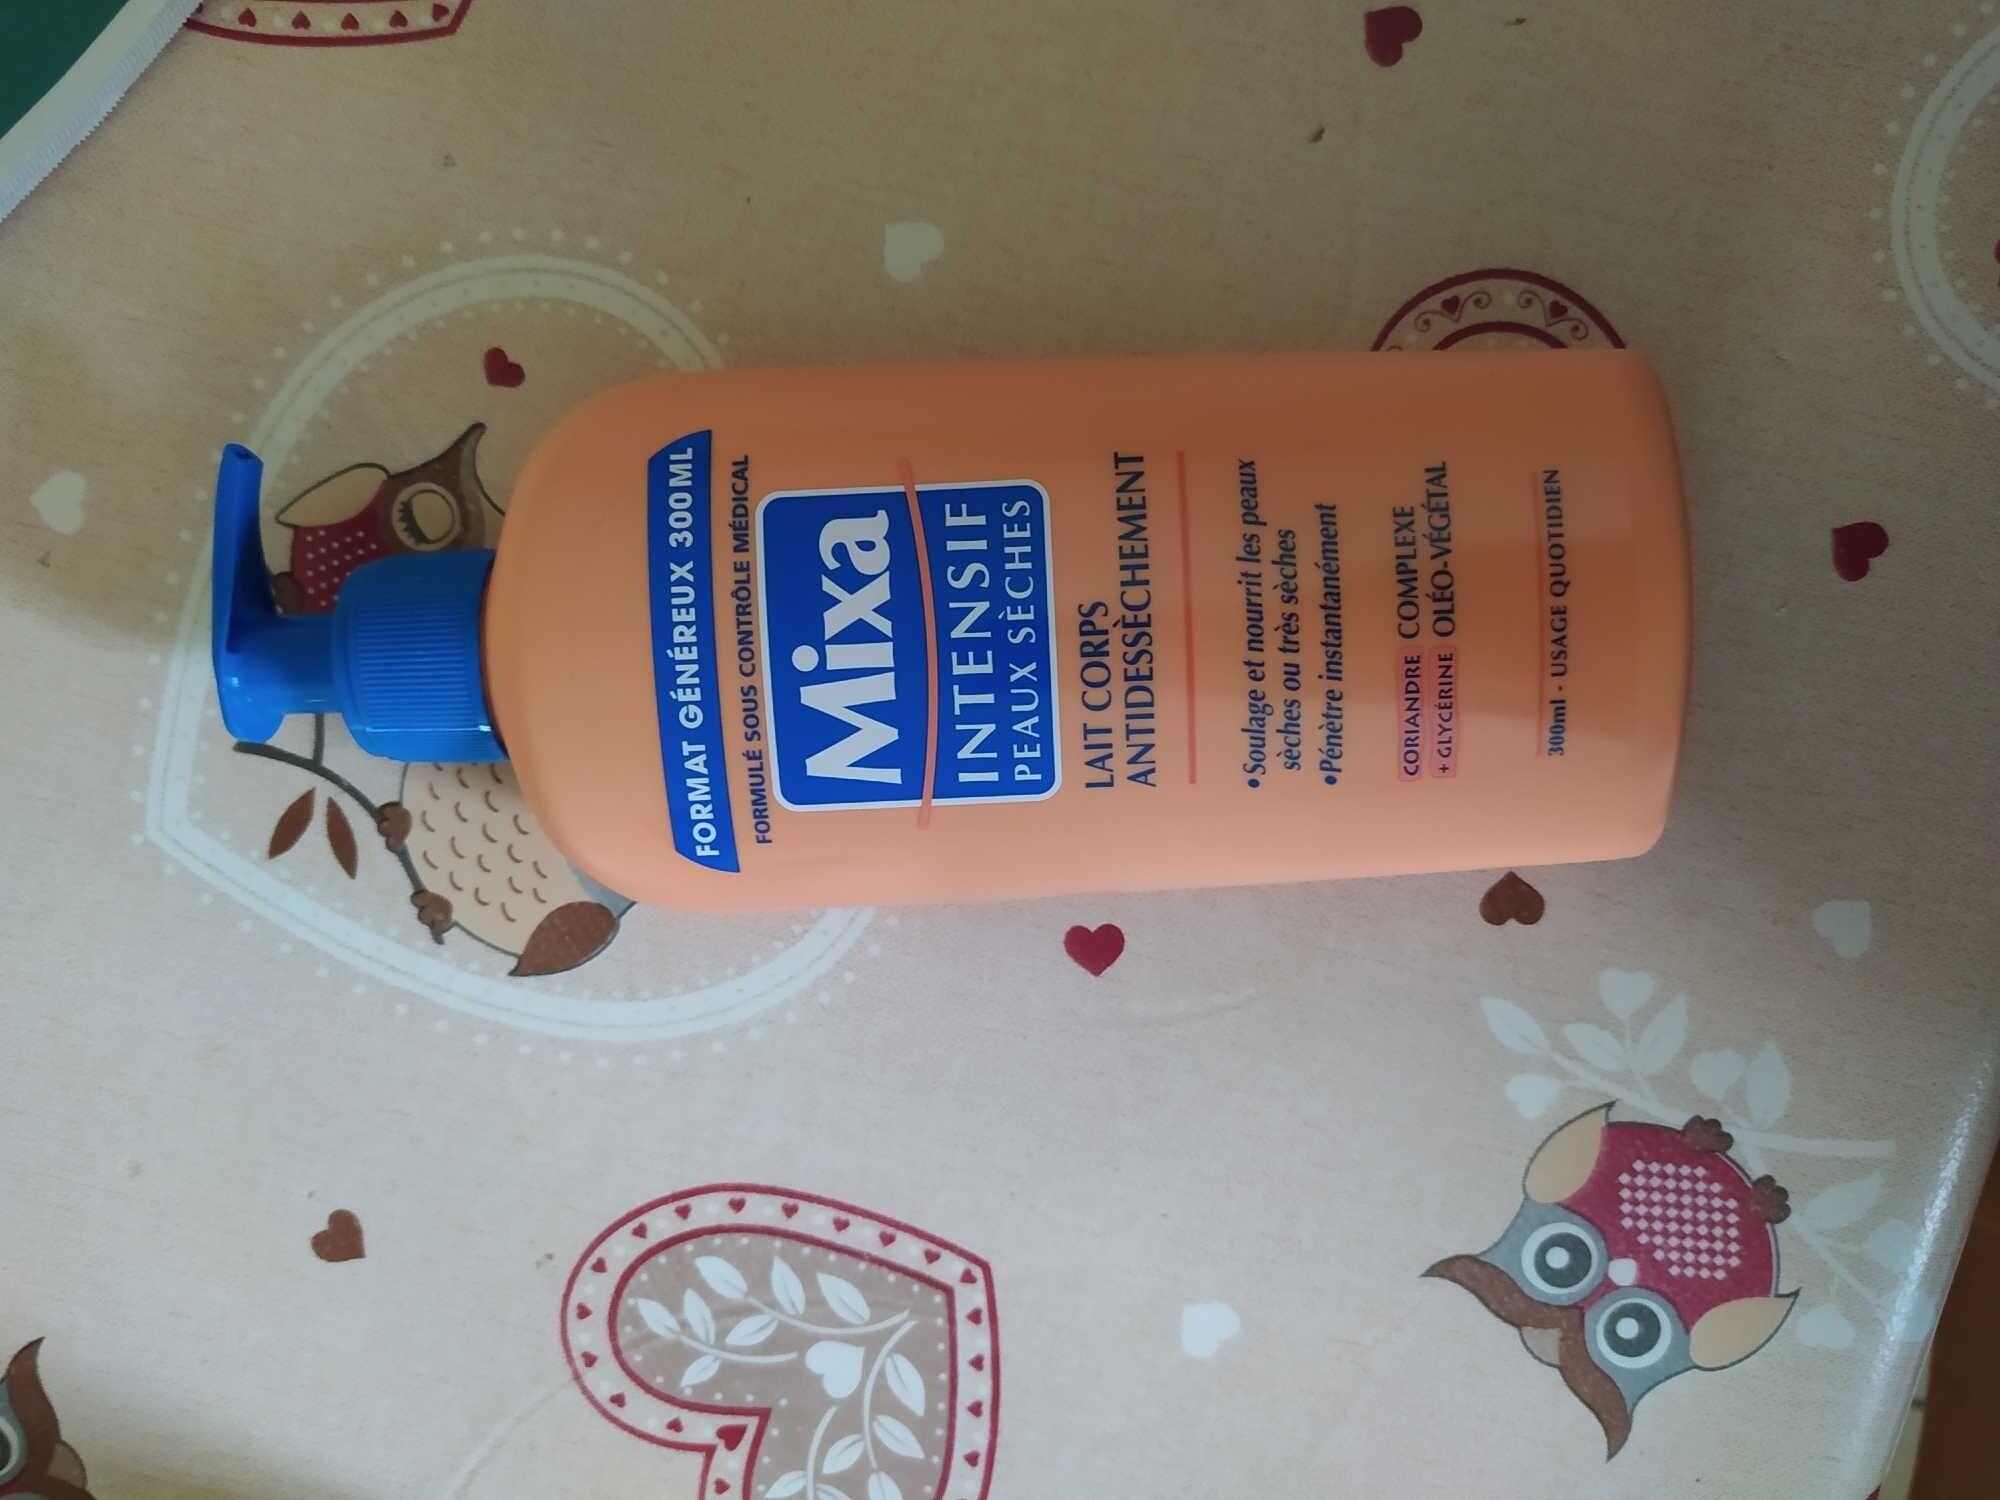 Mixa intensif peaux sèches 300 ml - Product - fr